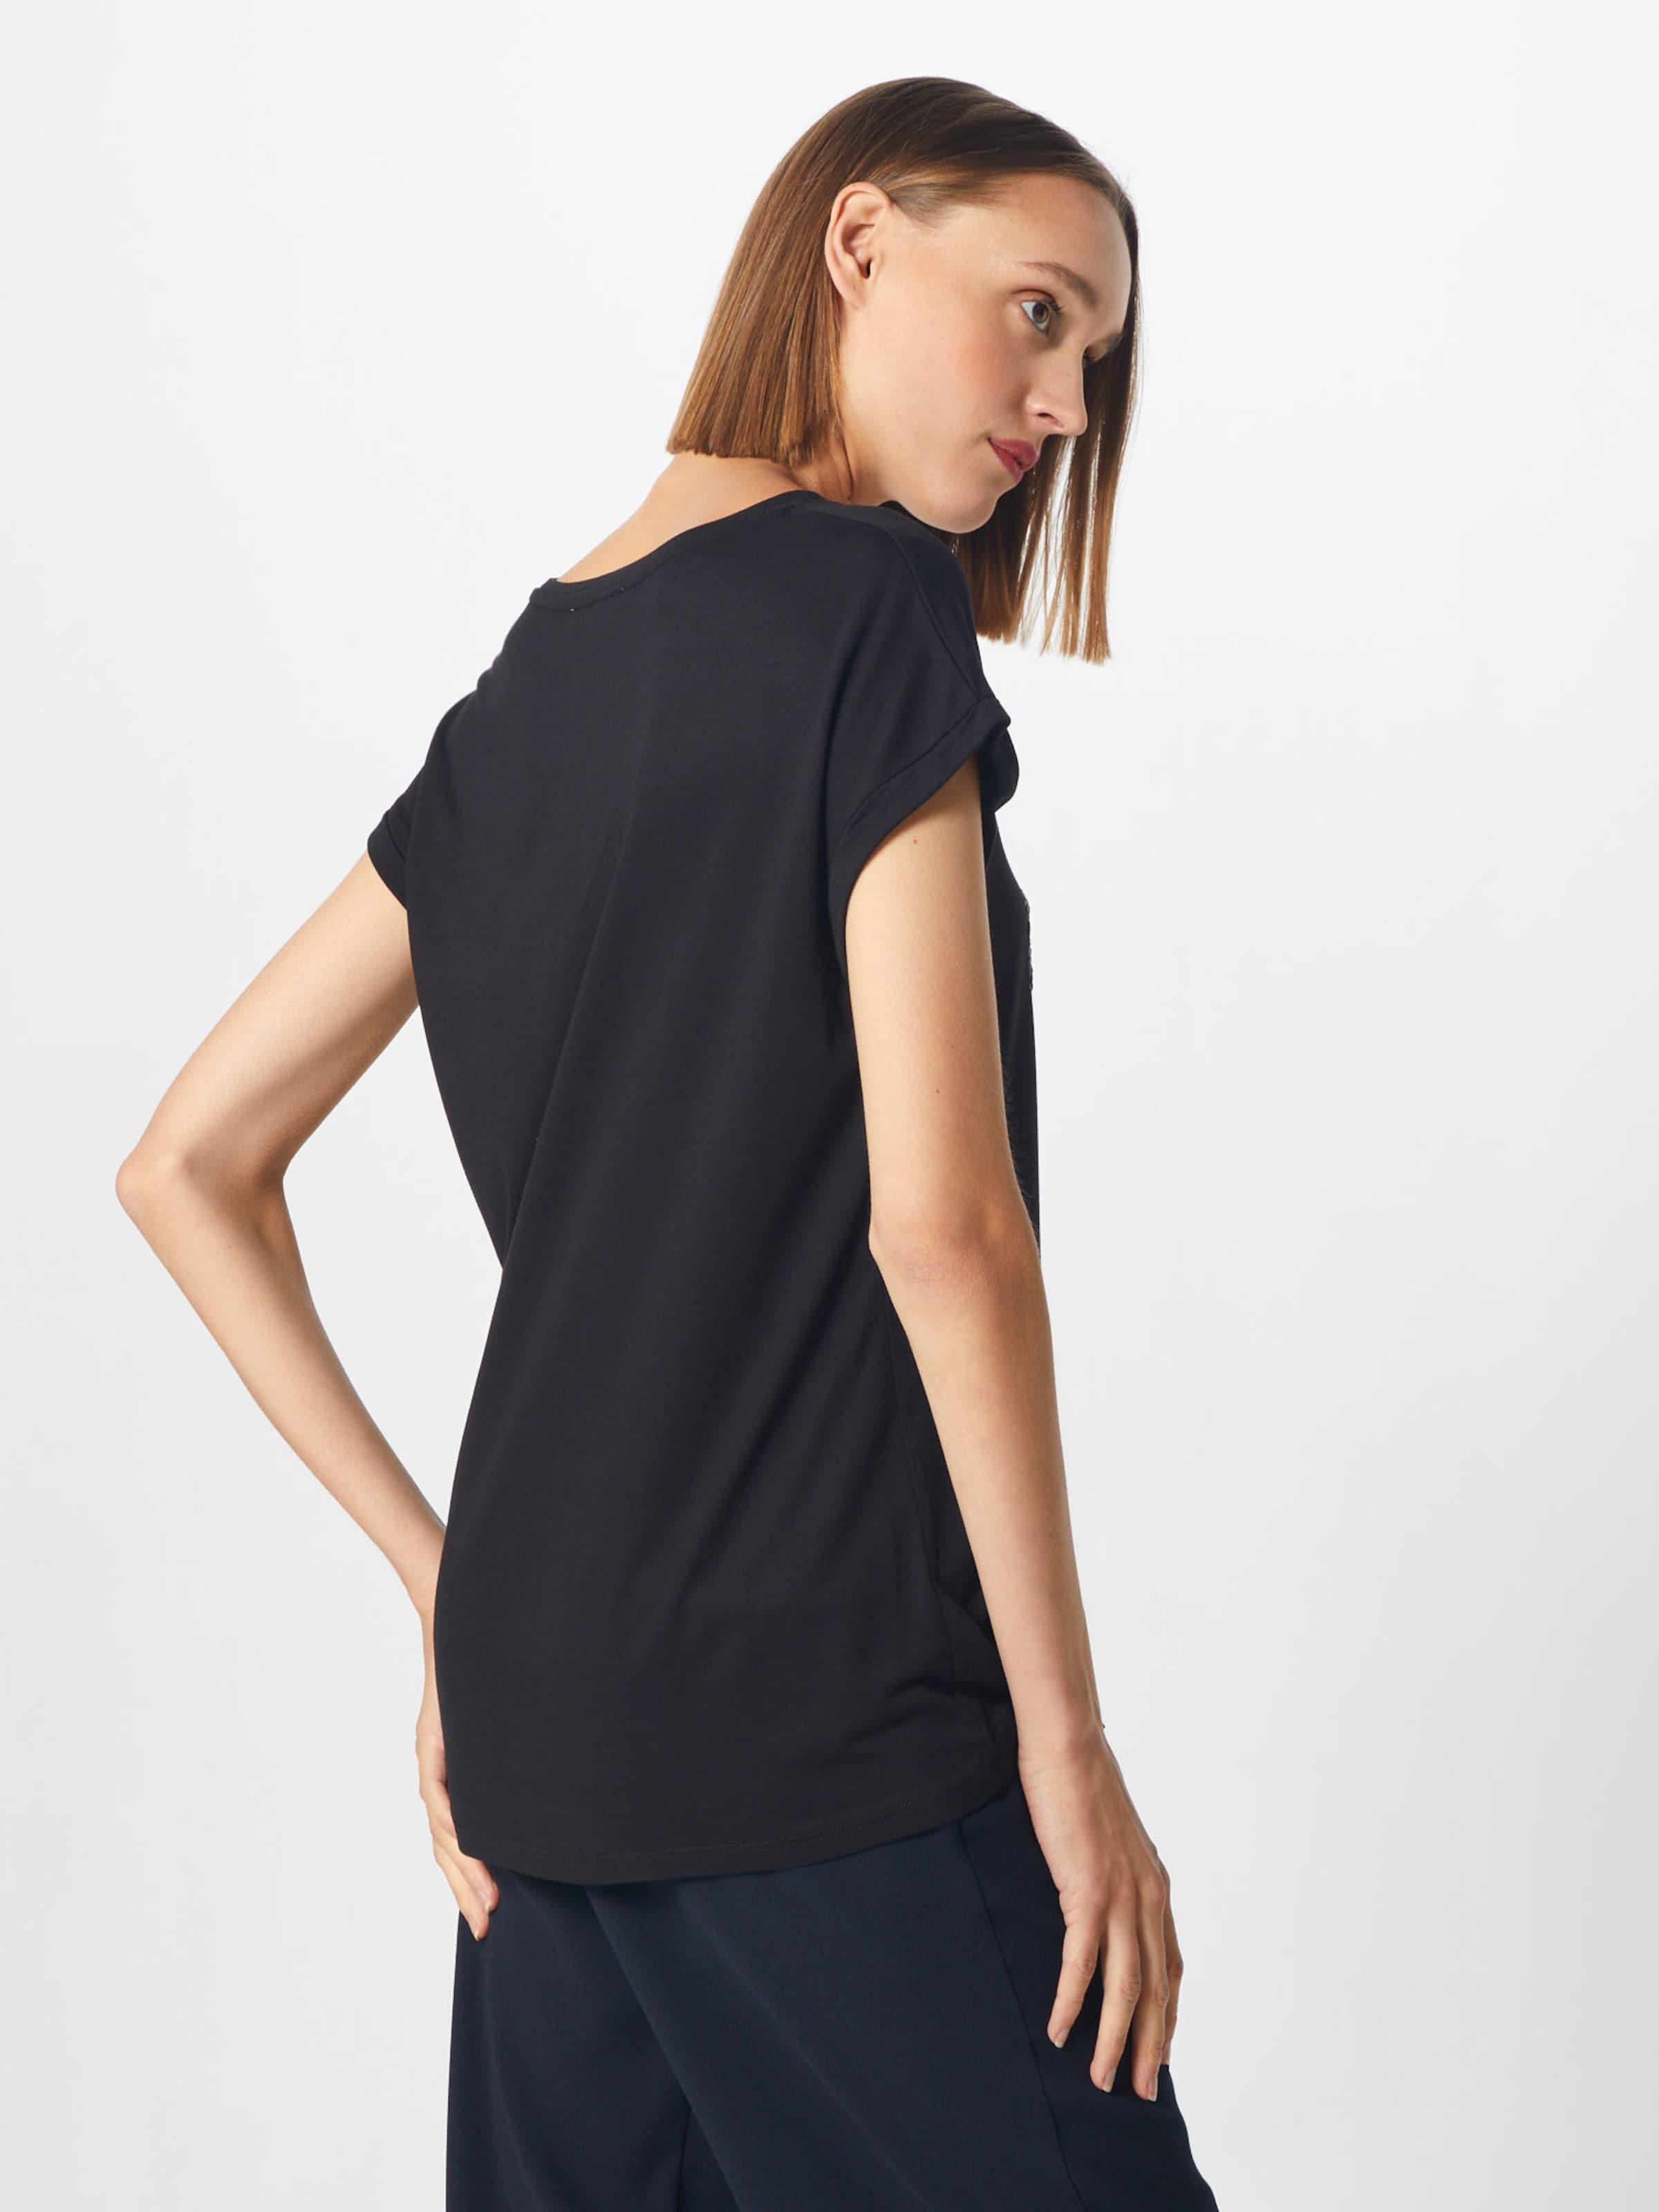 About 'aurelia' You Shirt In Schwarz Ygyb6fv7